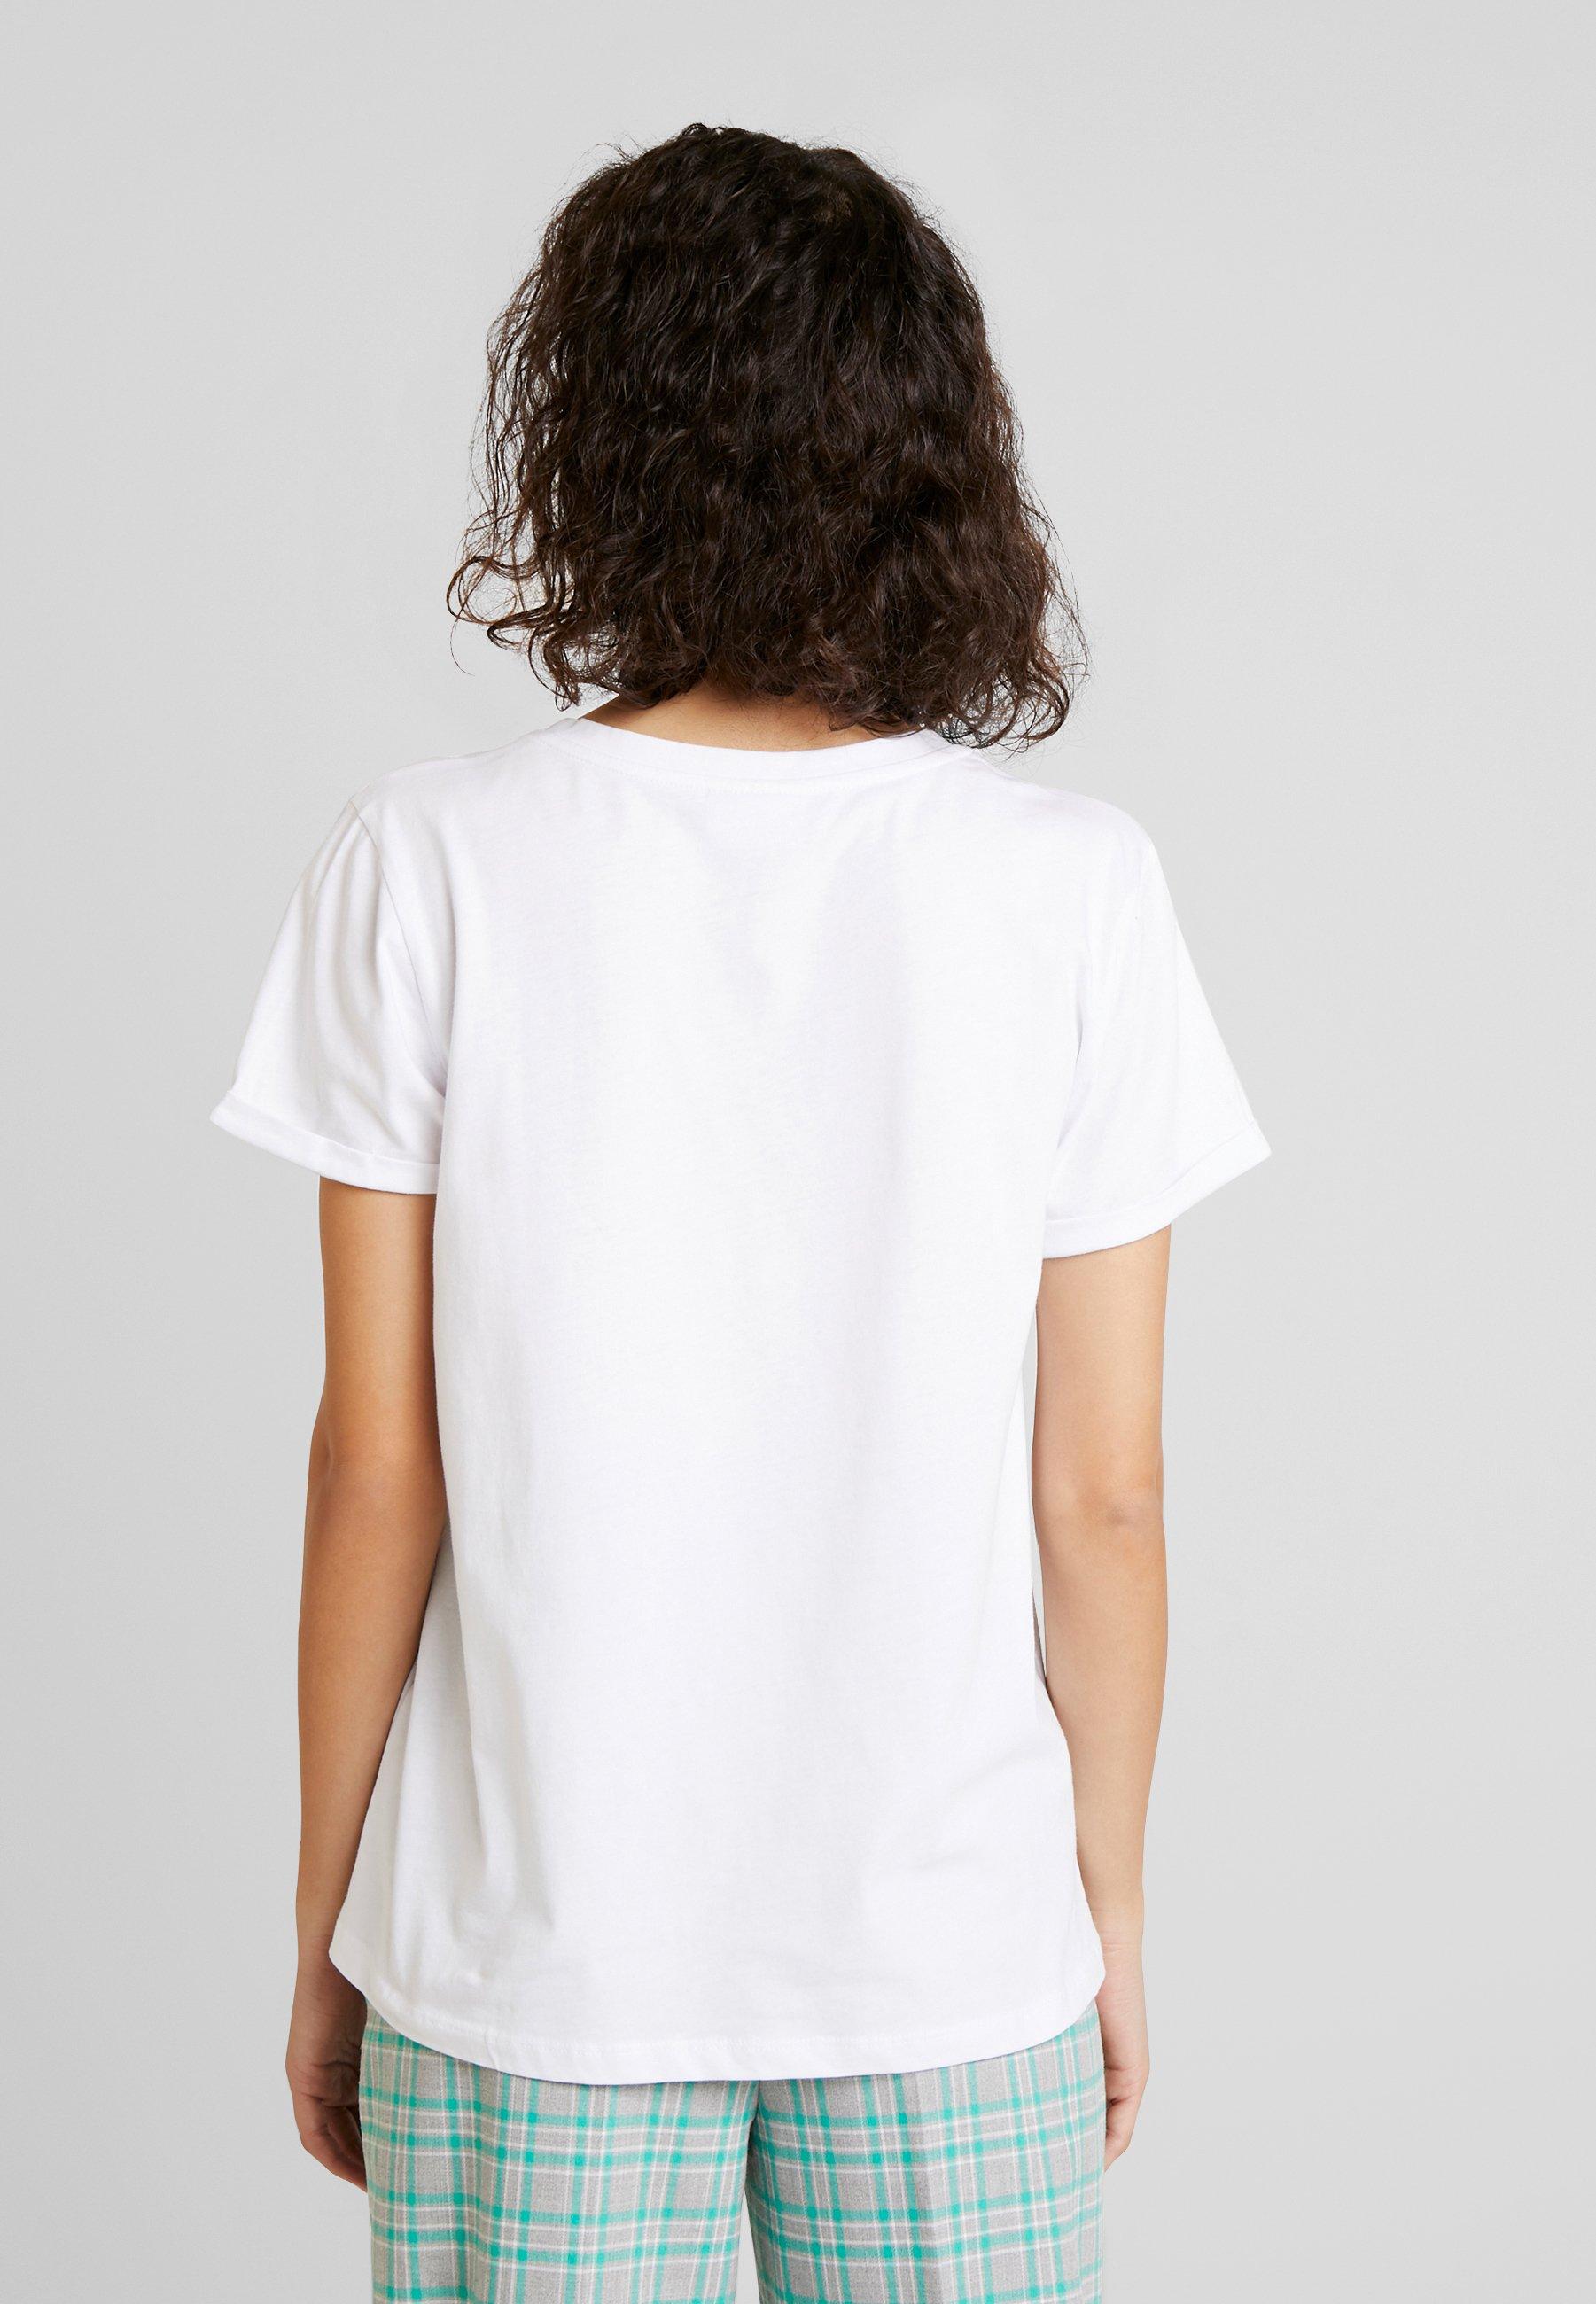 shirt White Optical WowT Imprimé Kaffe Jc3l1uTFK